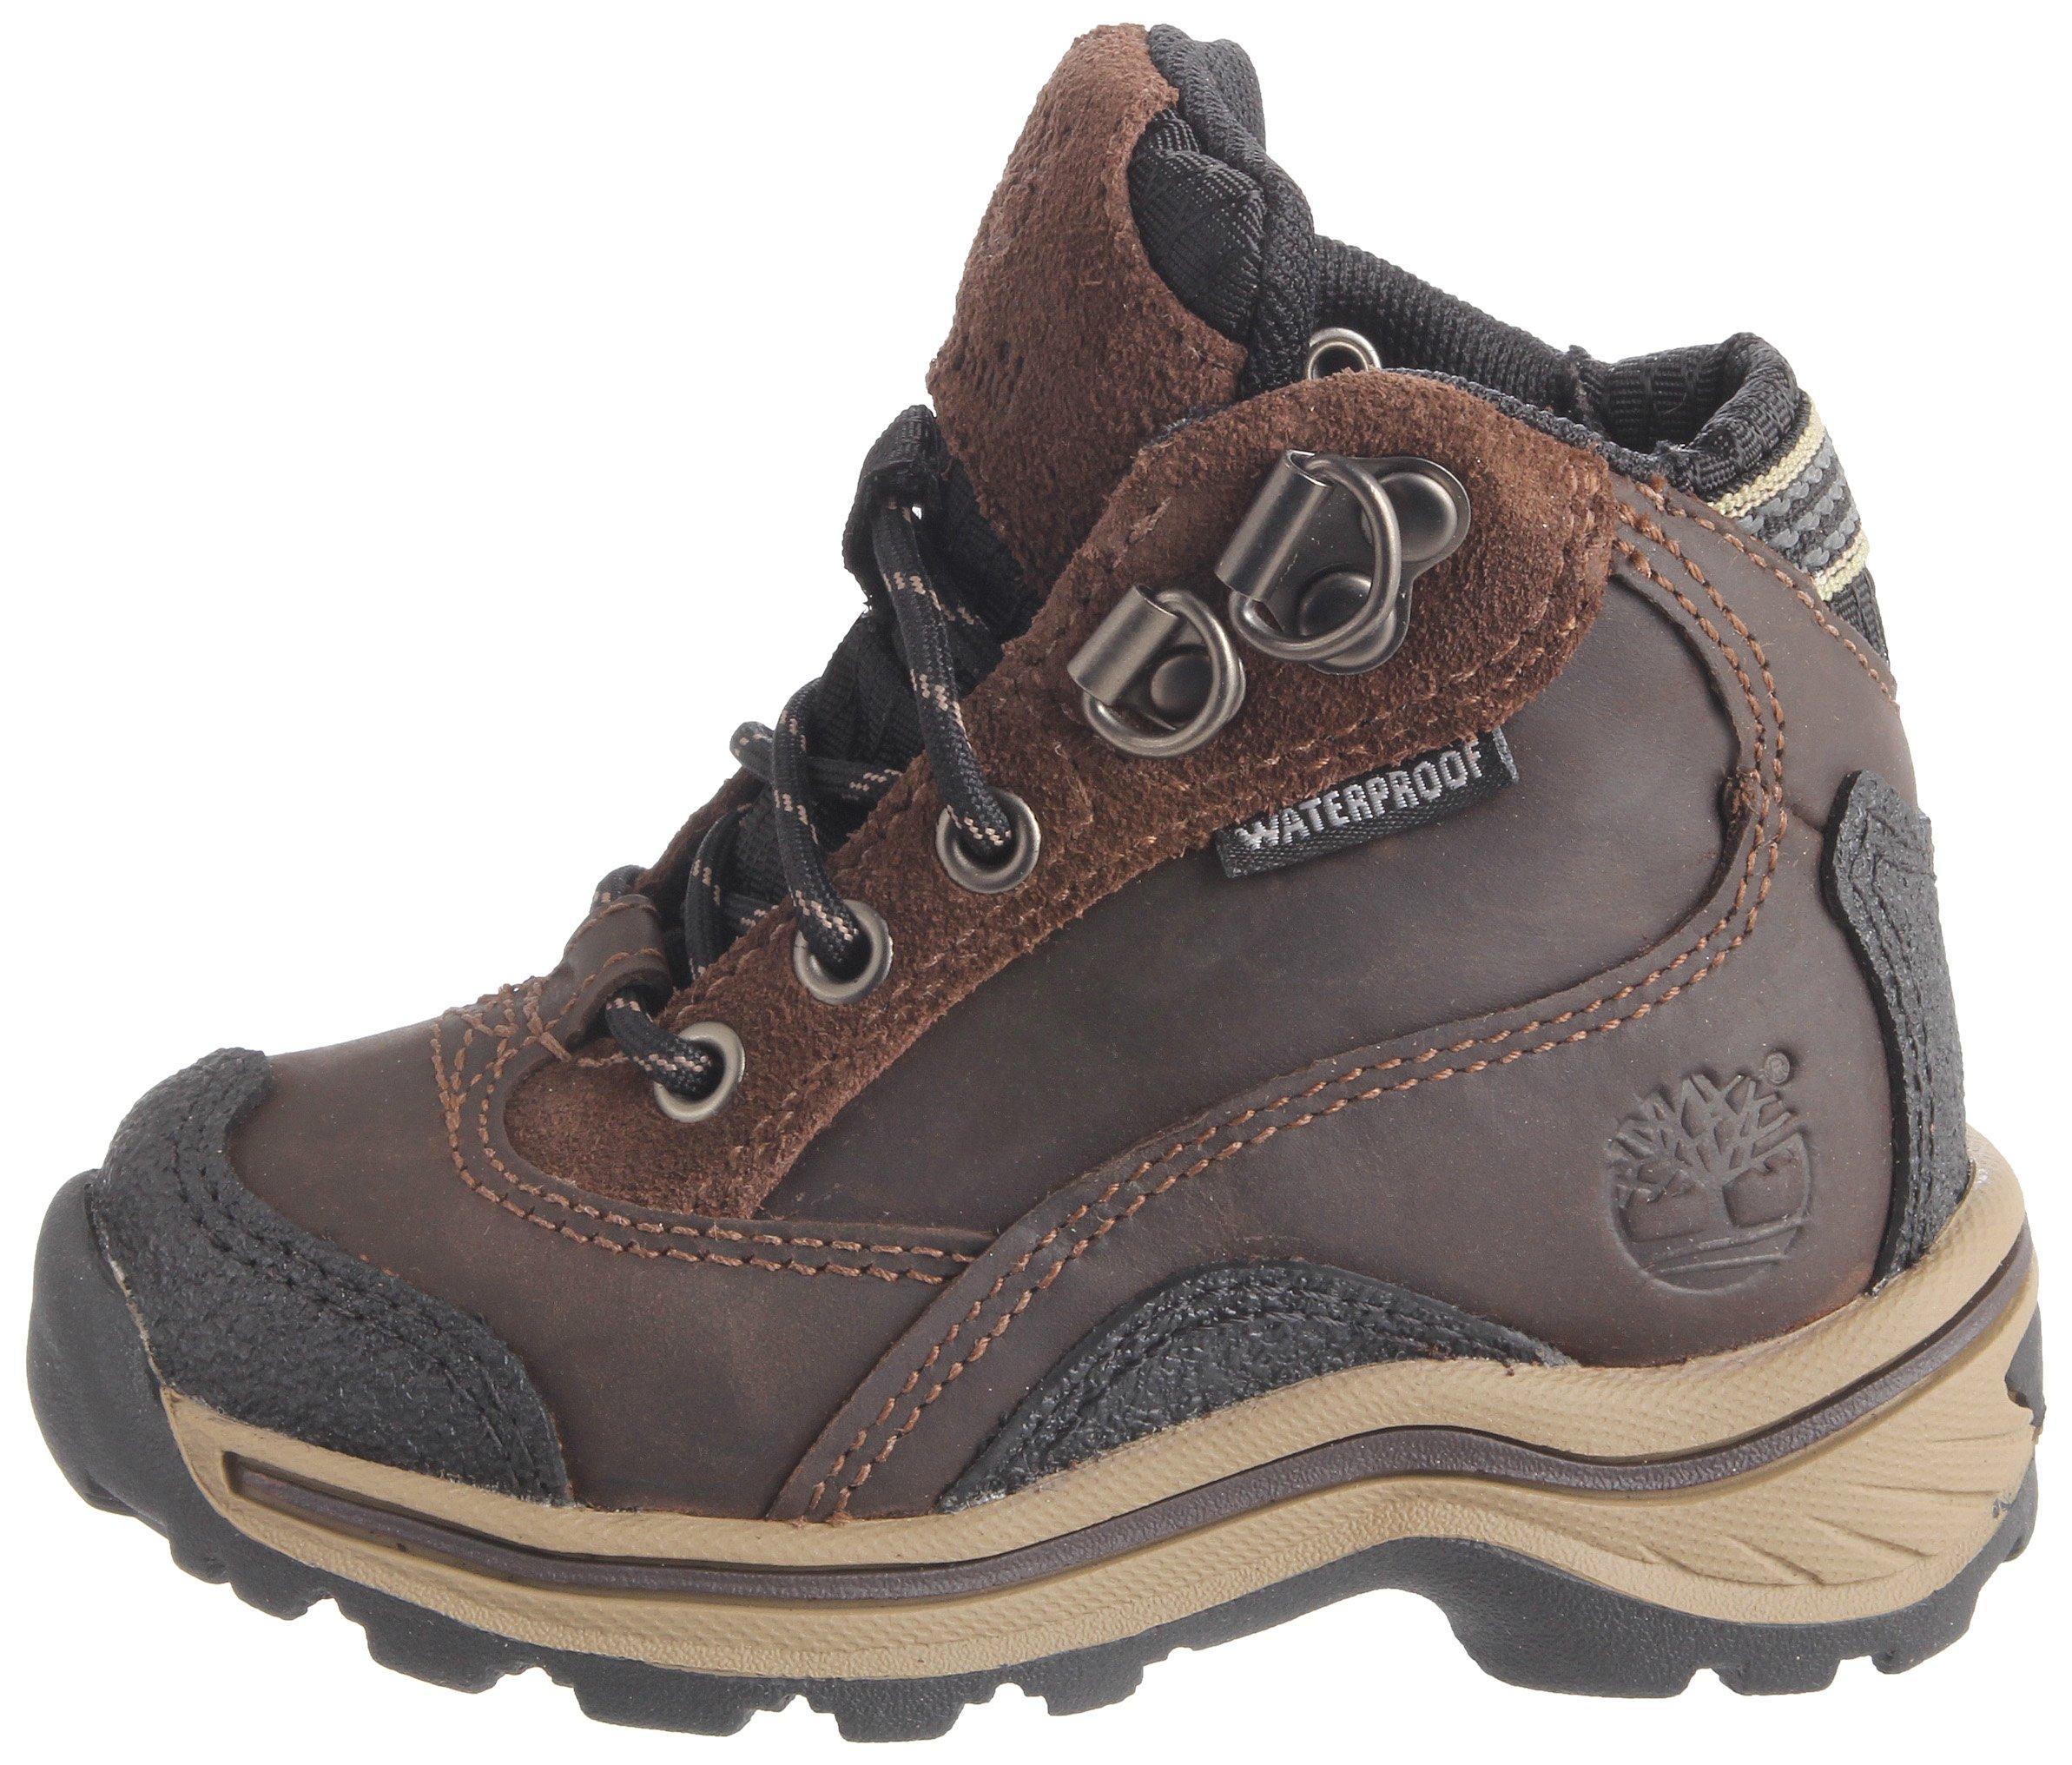 Timberland Pawtuckaway, Unisex-Child Hiking Shoes 5